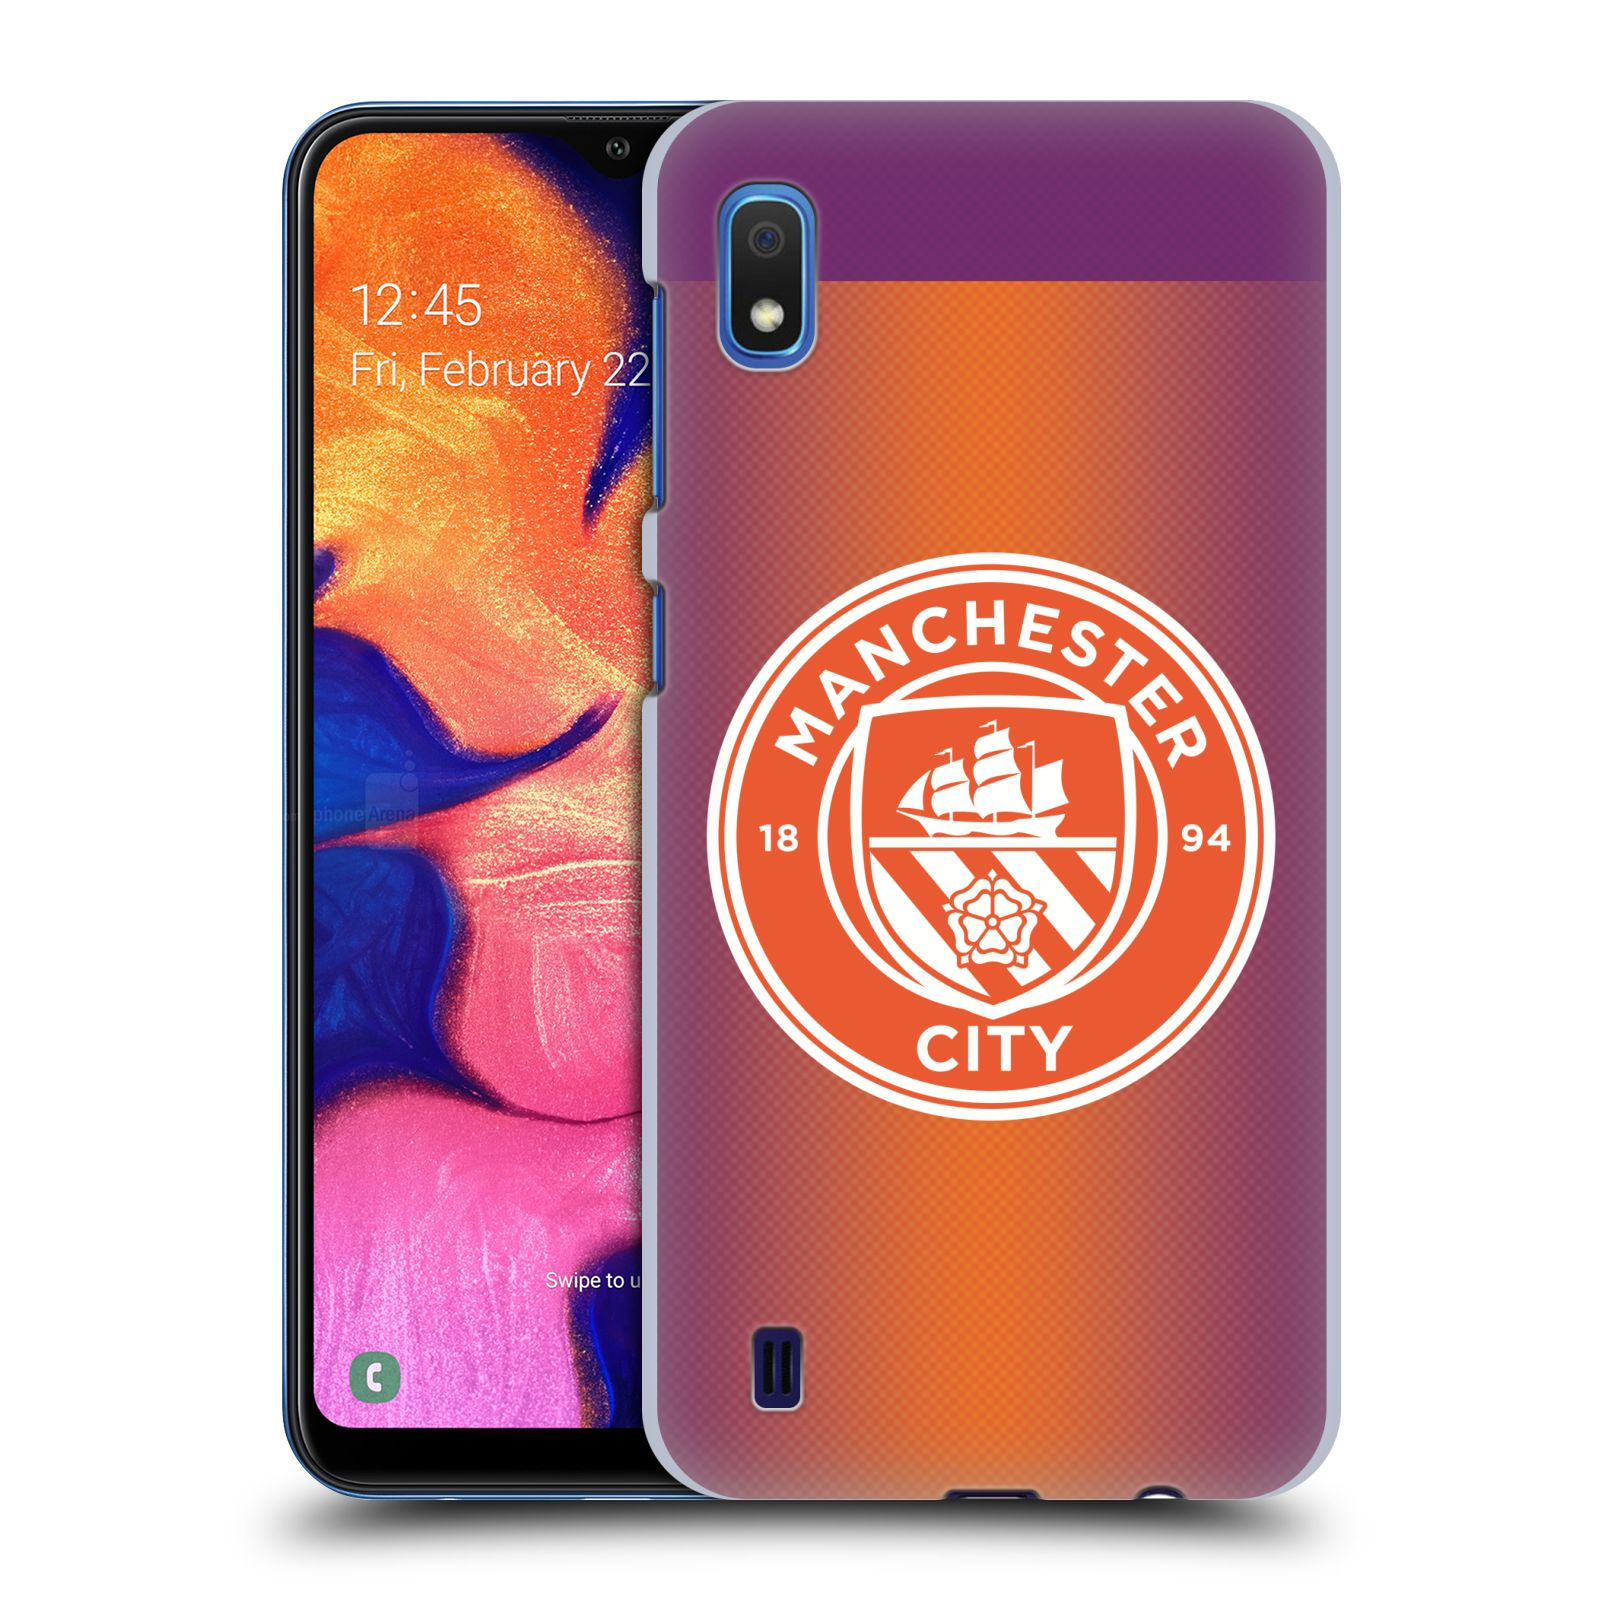 Plastové pouzdro na mobil Samsung Galaxy A10 - Head Case - Manchester City FC - Oranžové nové logo